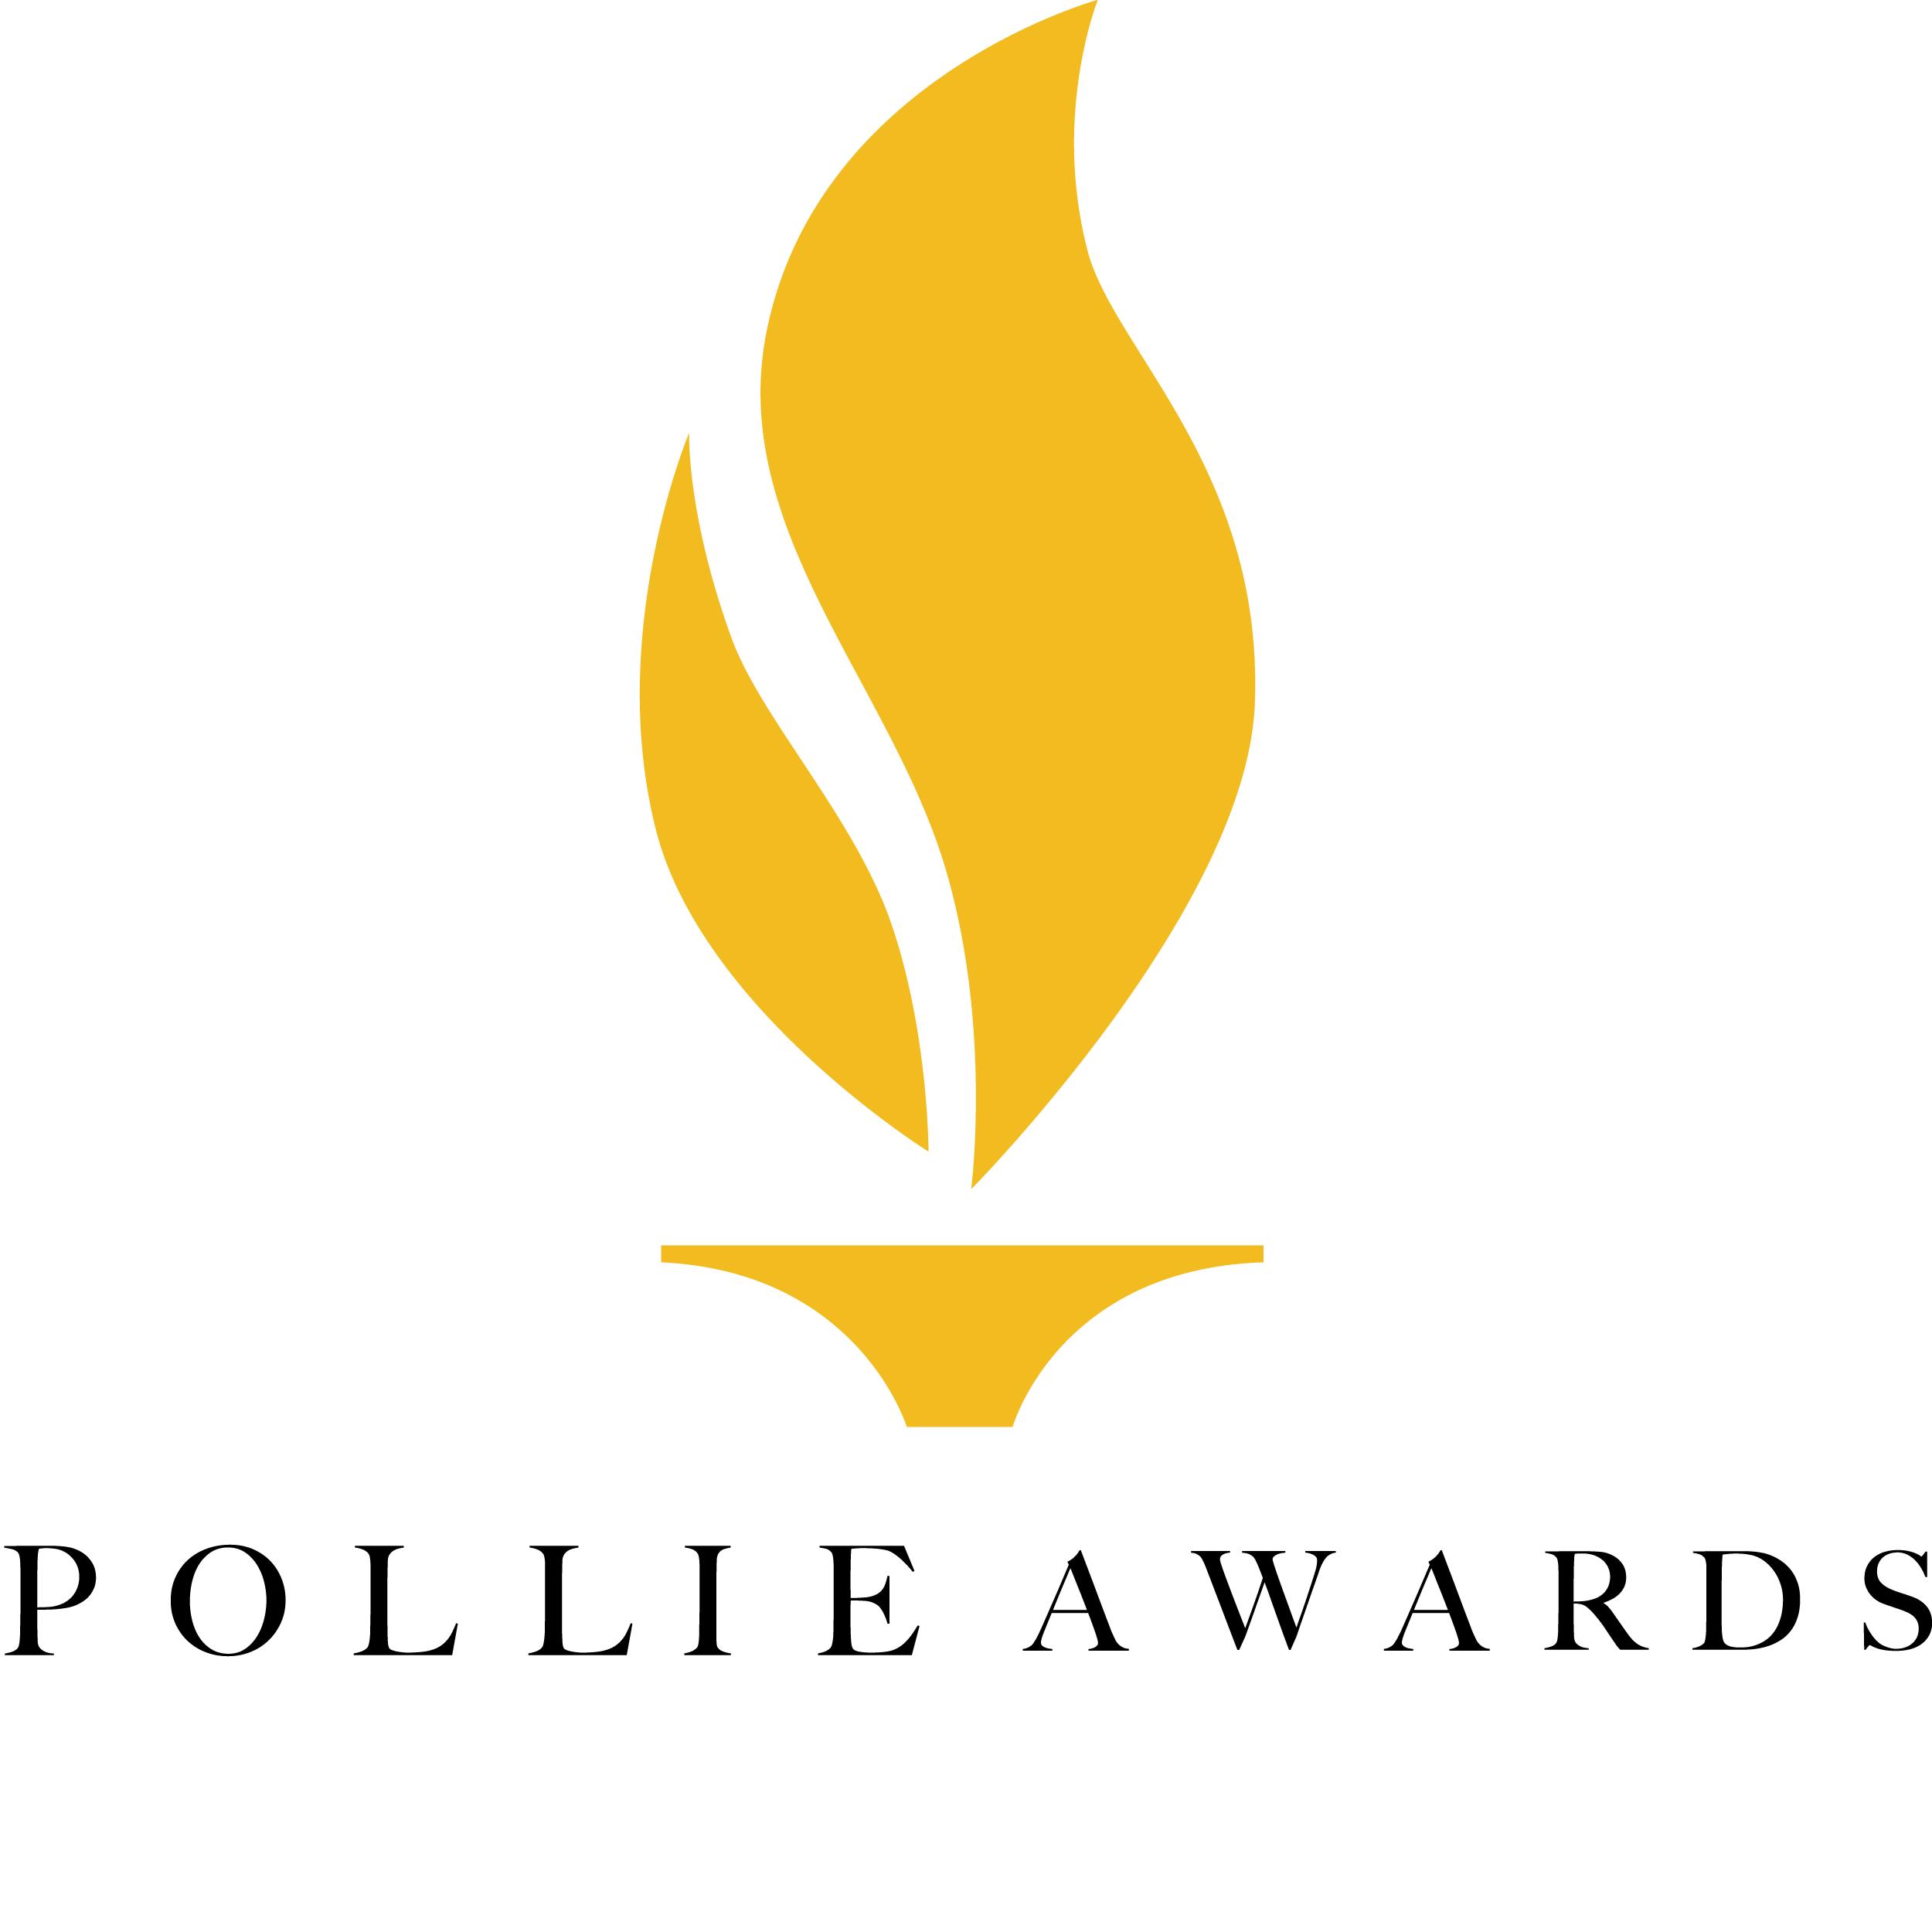 Pollie Awards